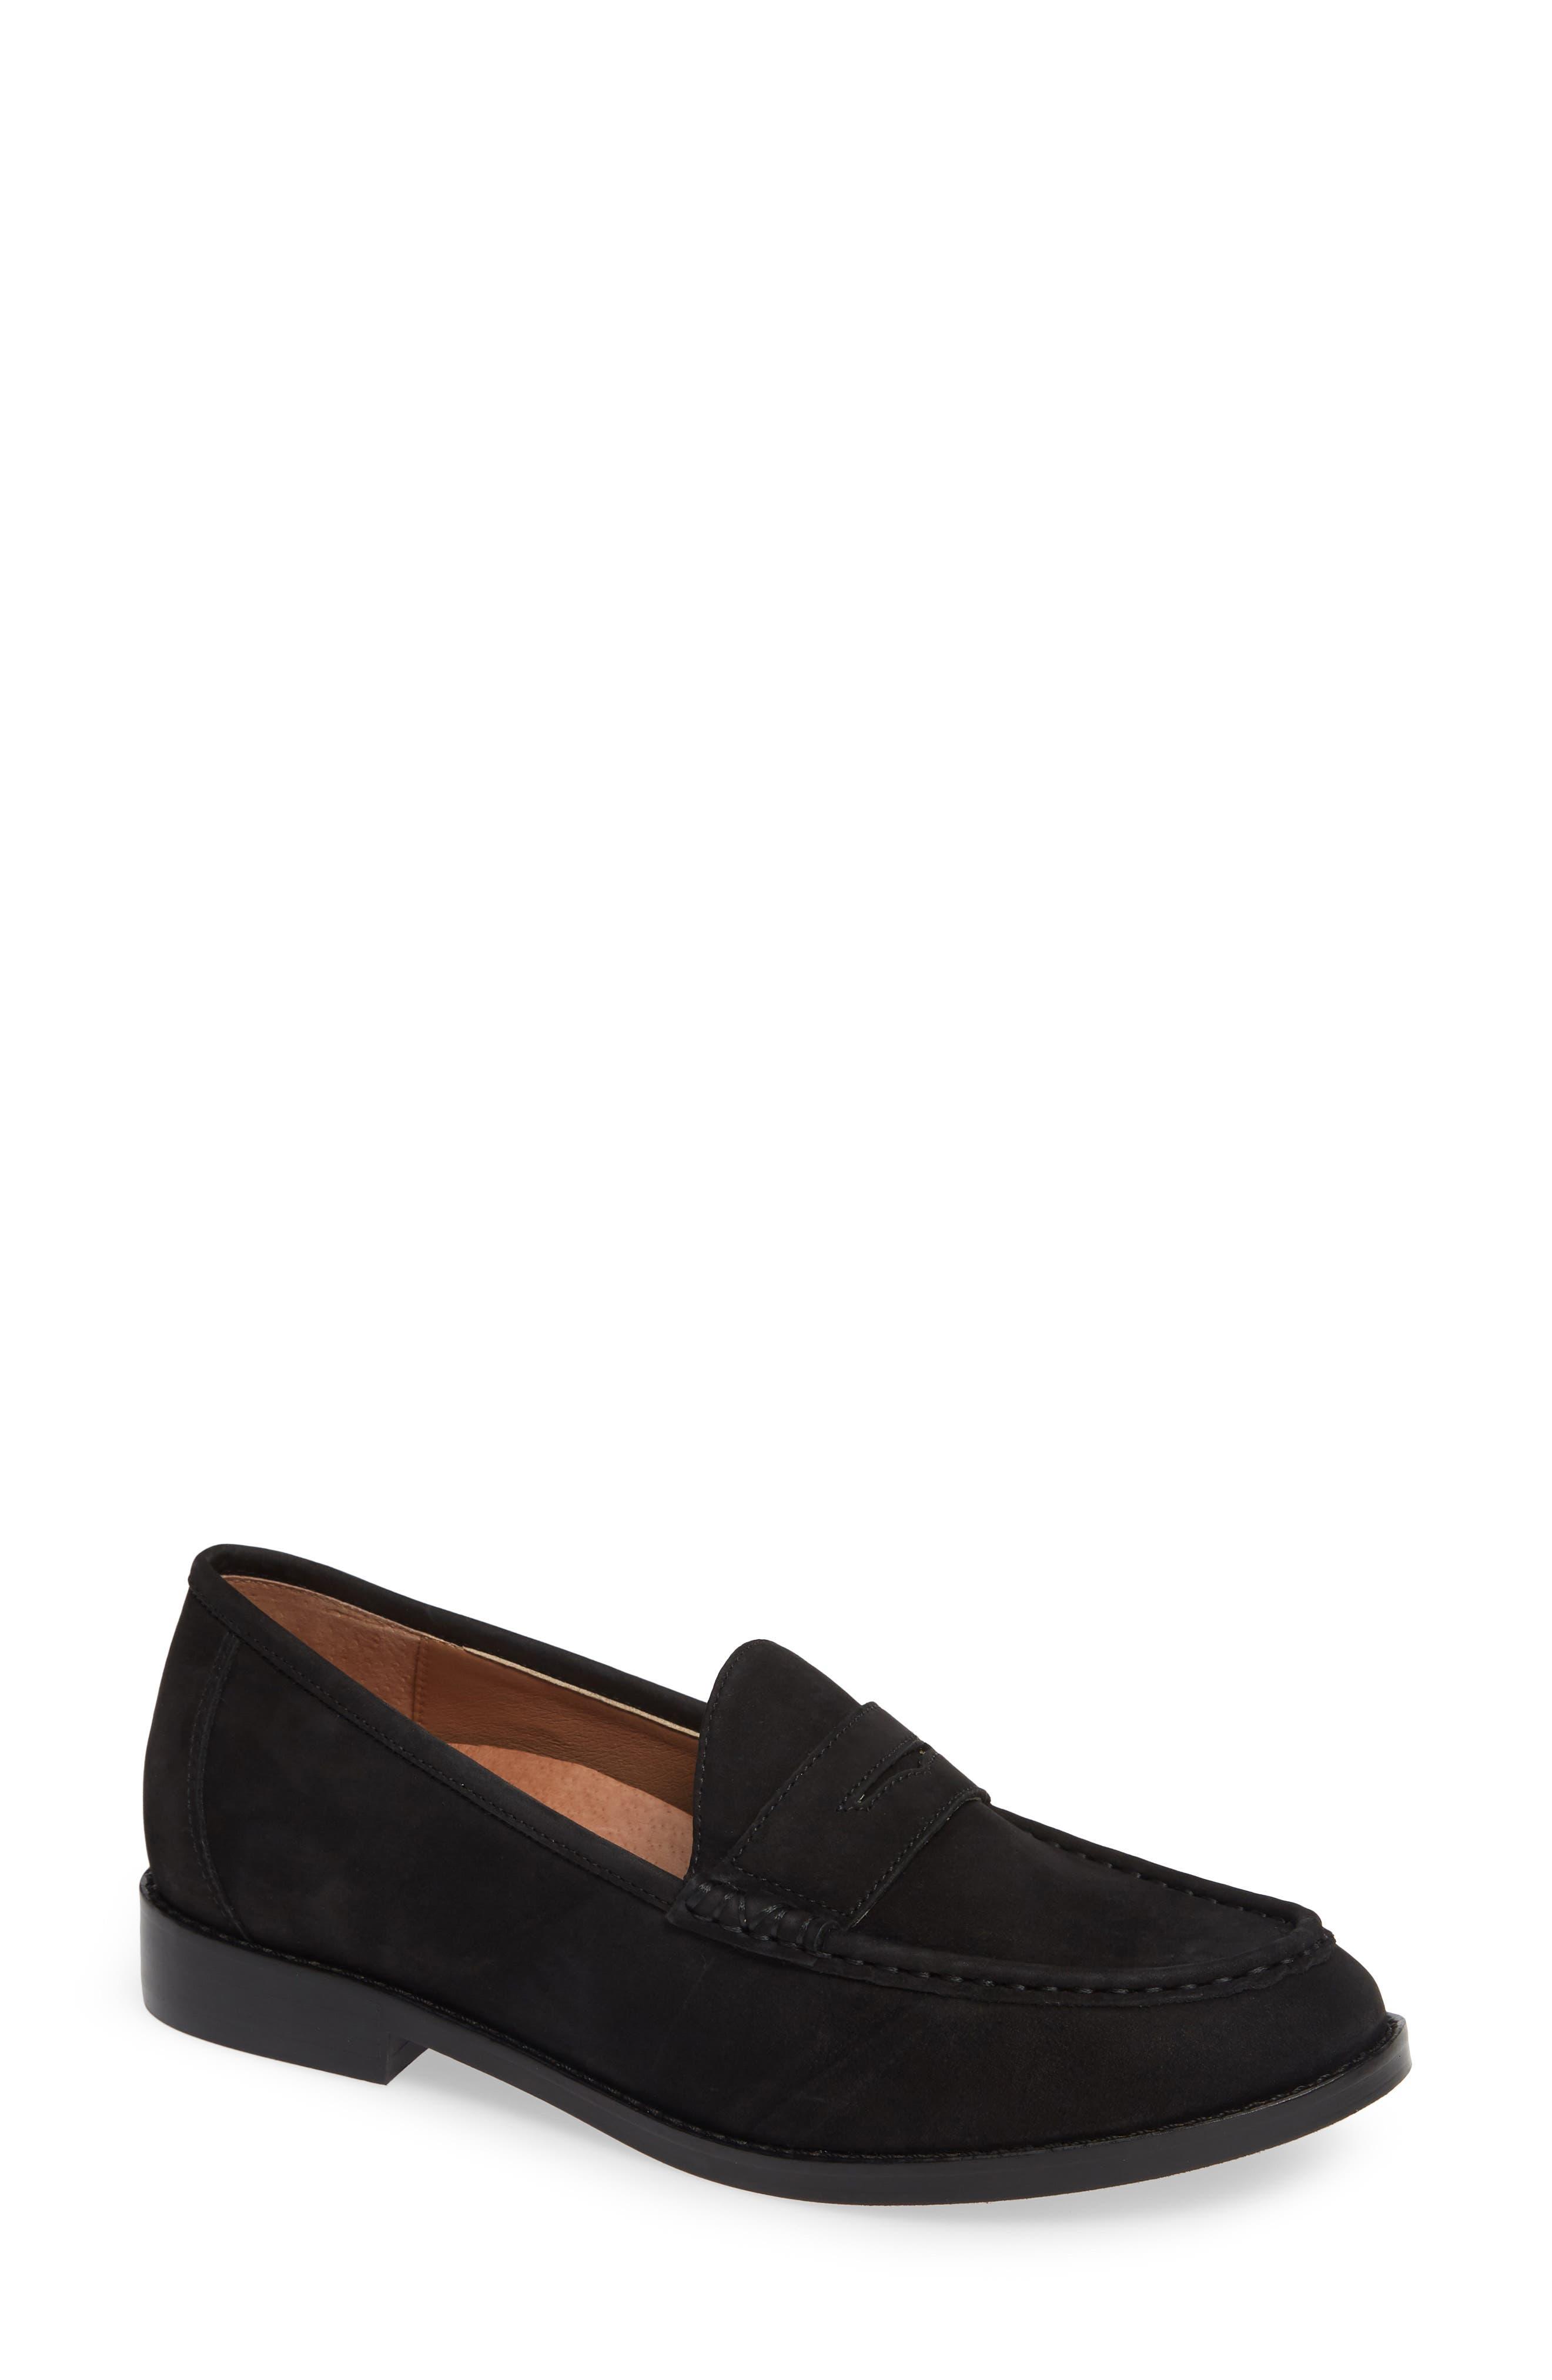 Women's Vionic Shoes | Nordstrom